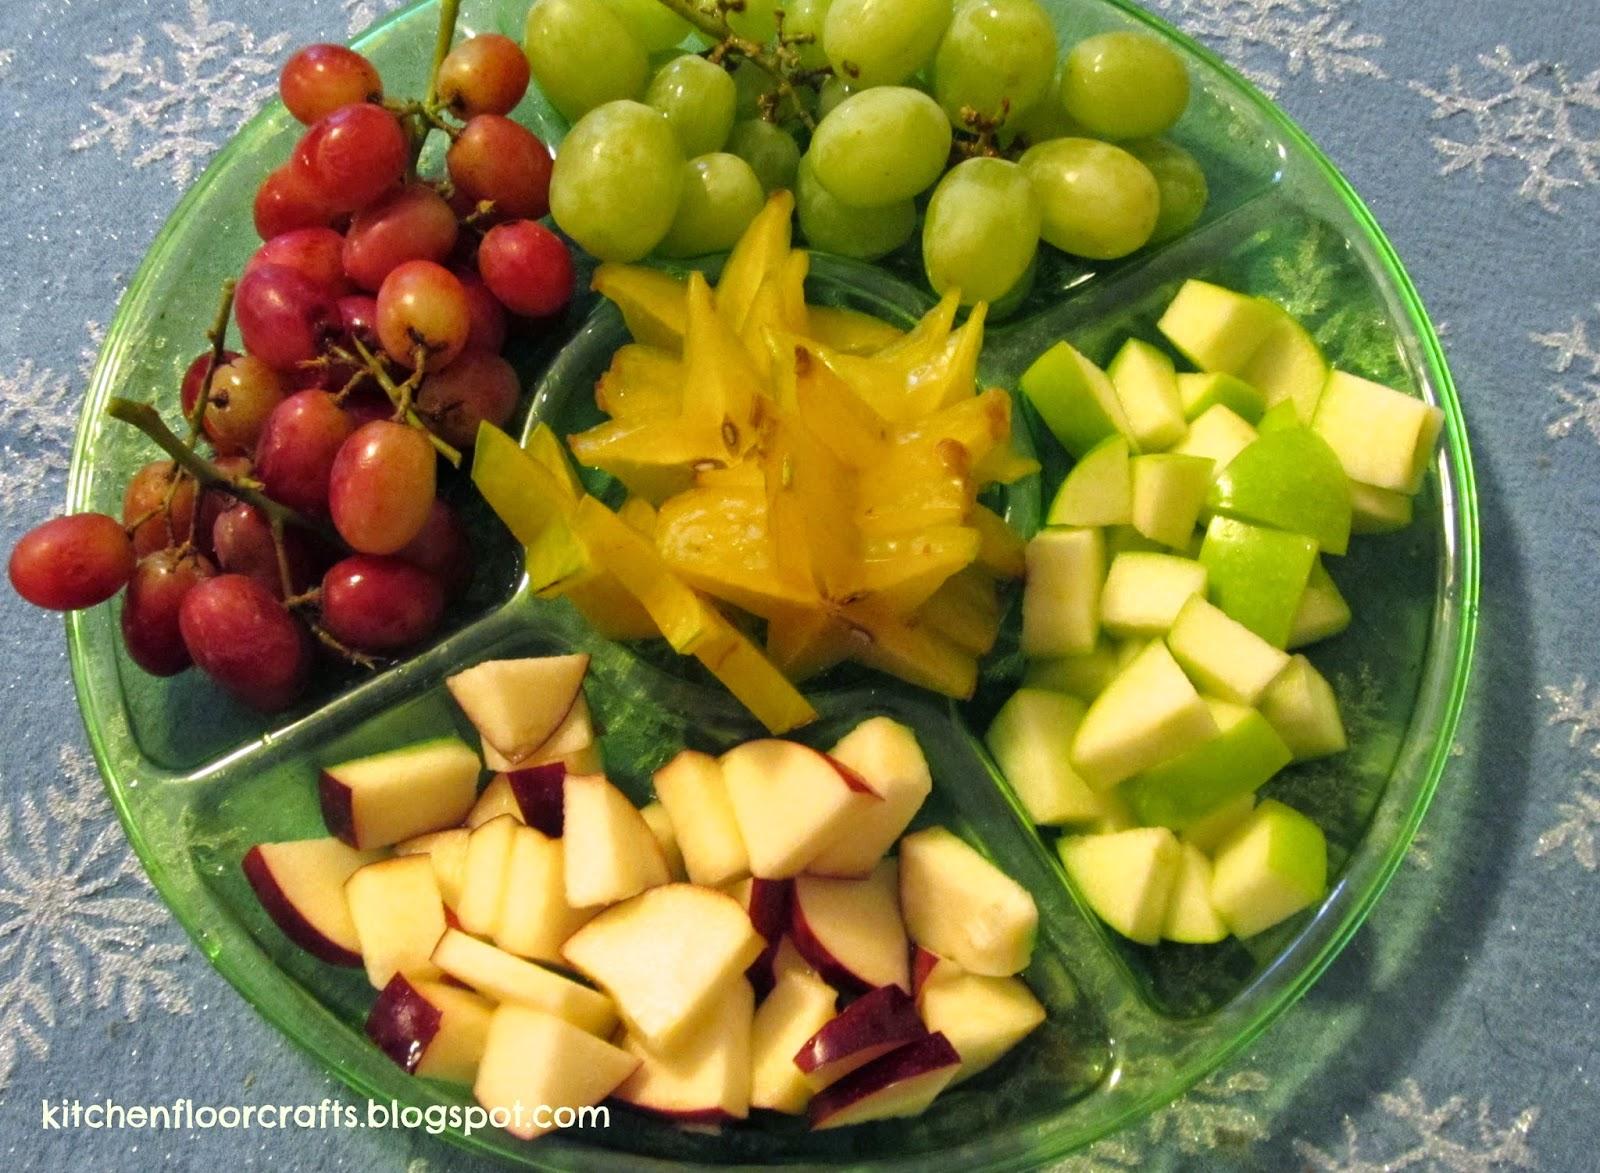 Kitchen Floor Crafts: Christmas Fruit Wands